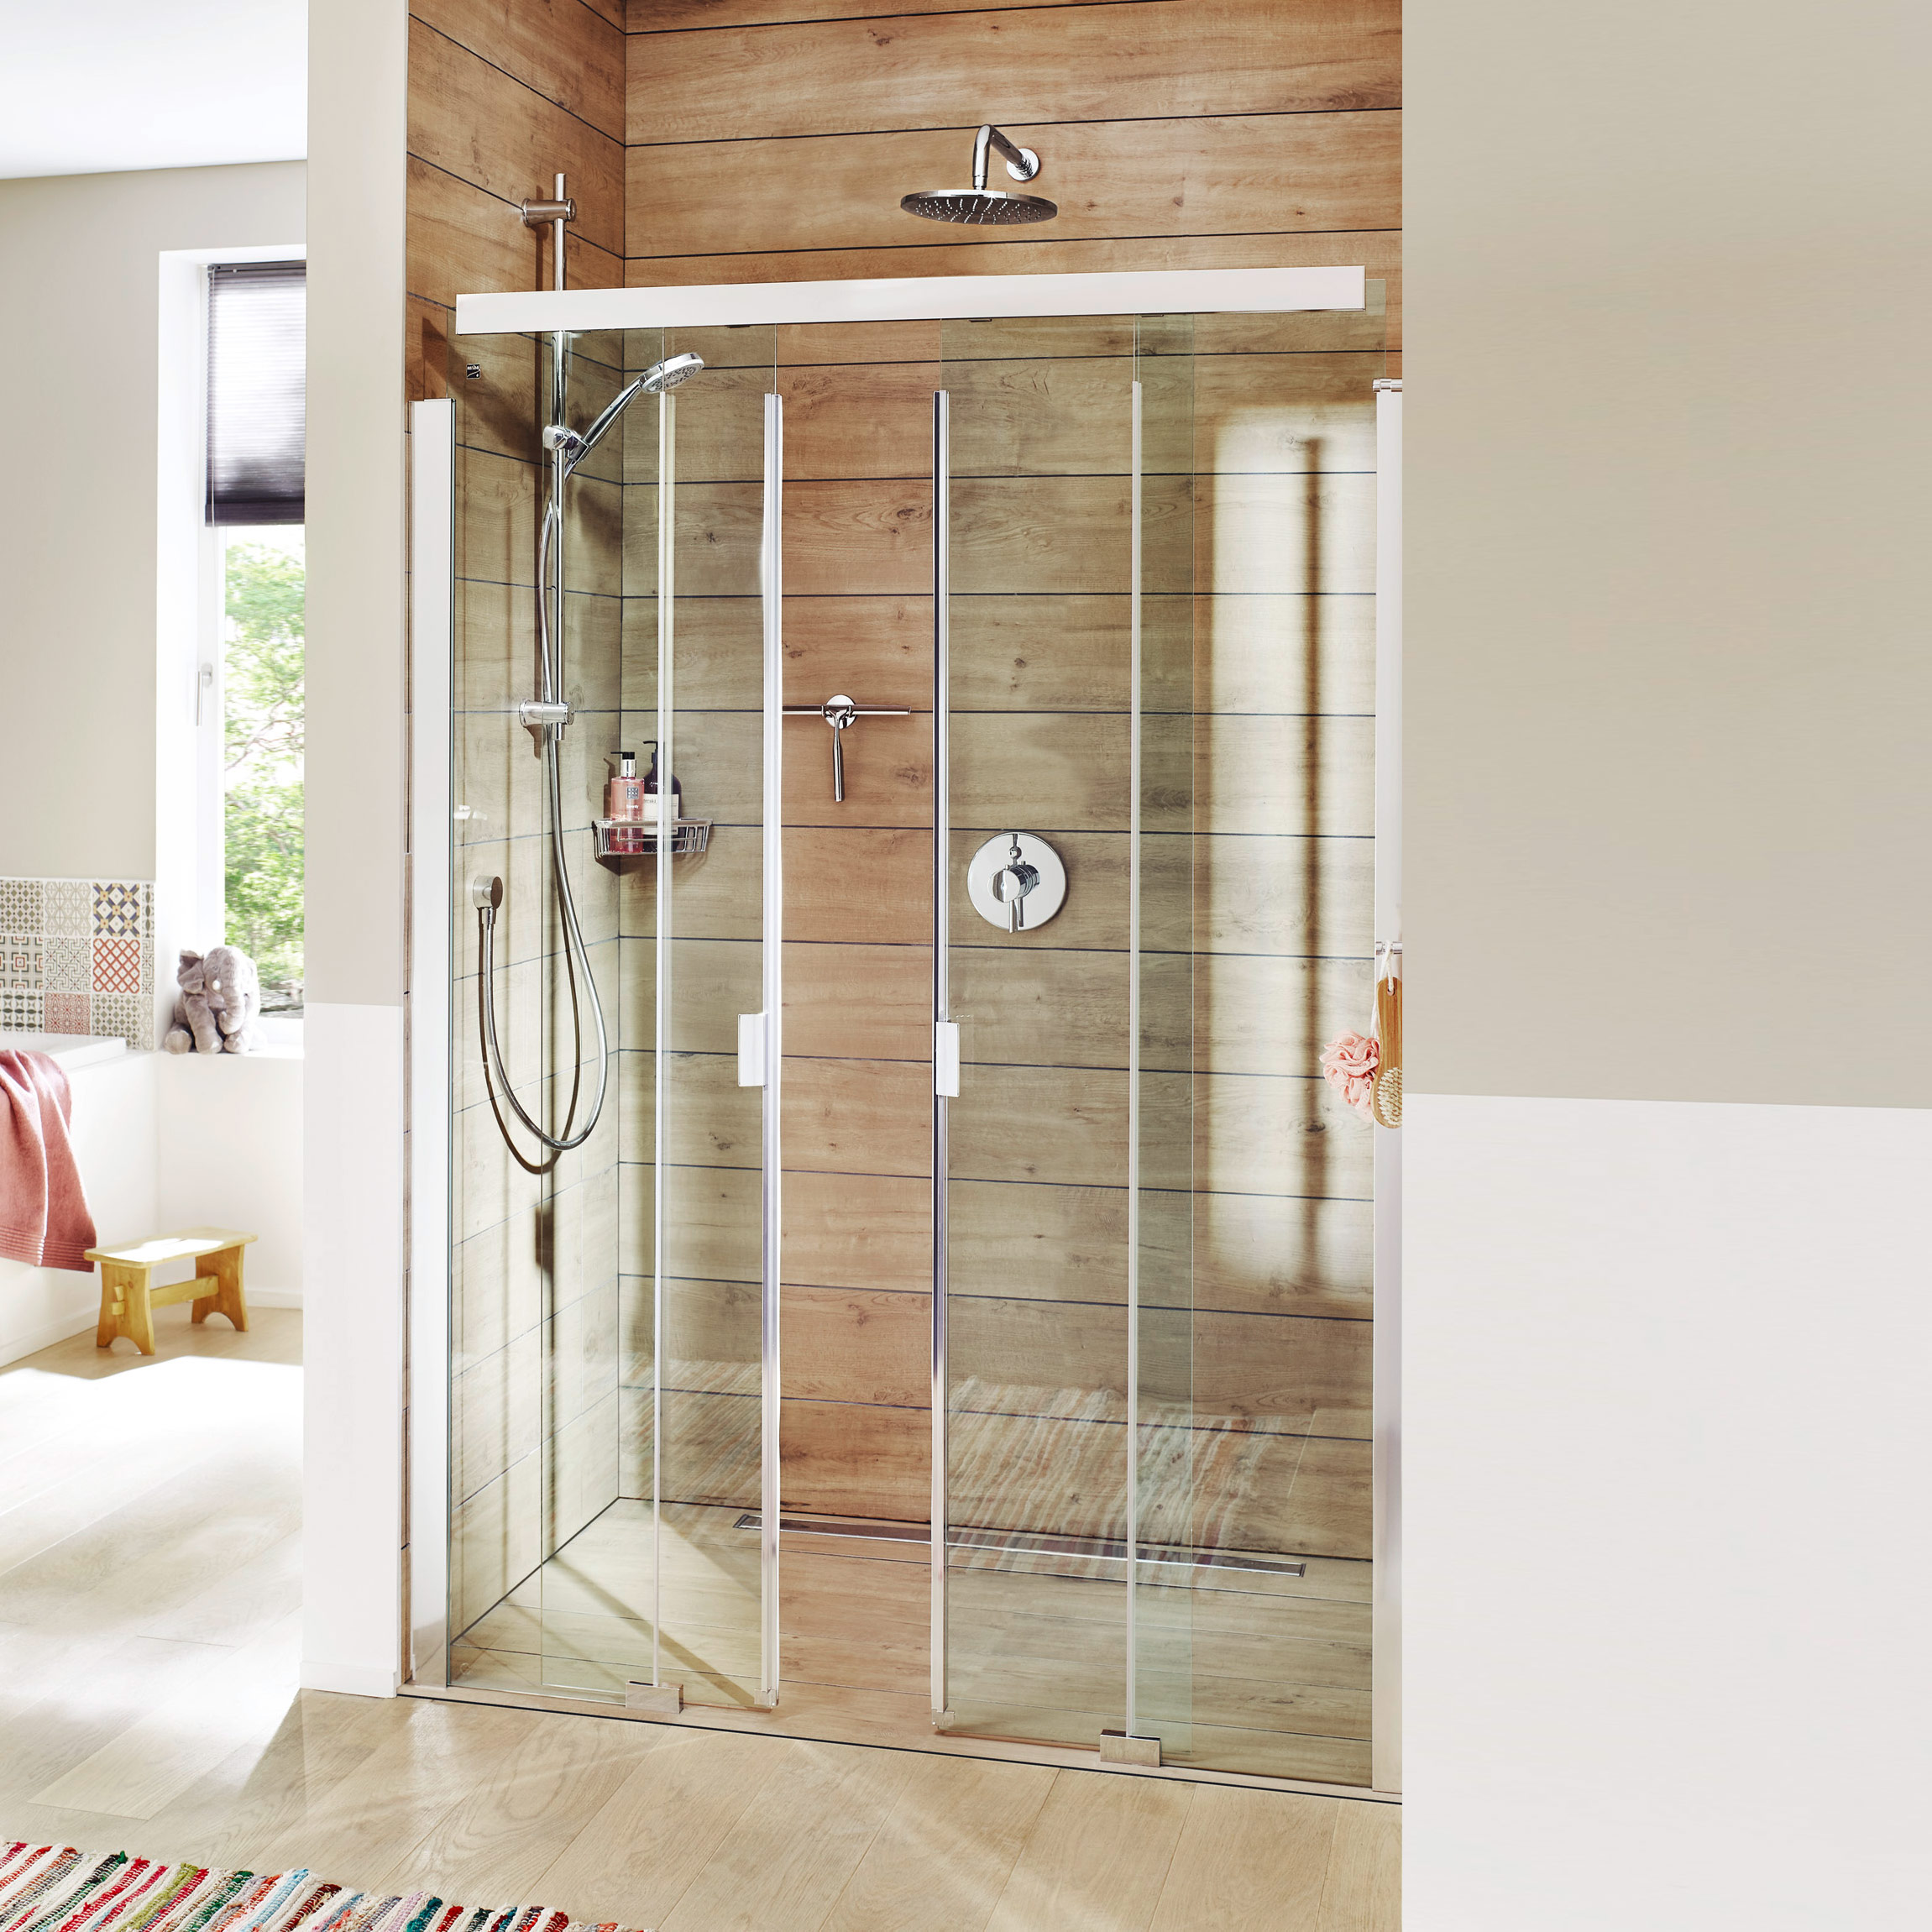 serie 3001 duschabtrennungen slide. Black Bedroom Furniture Sets. Home Design Ideas